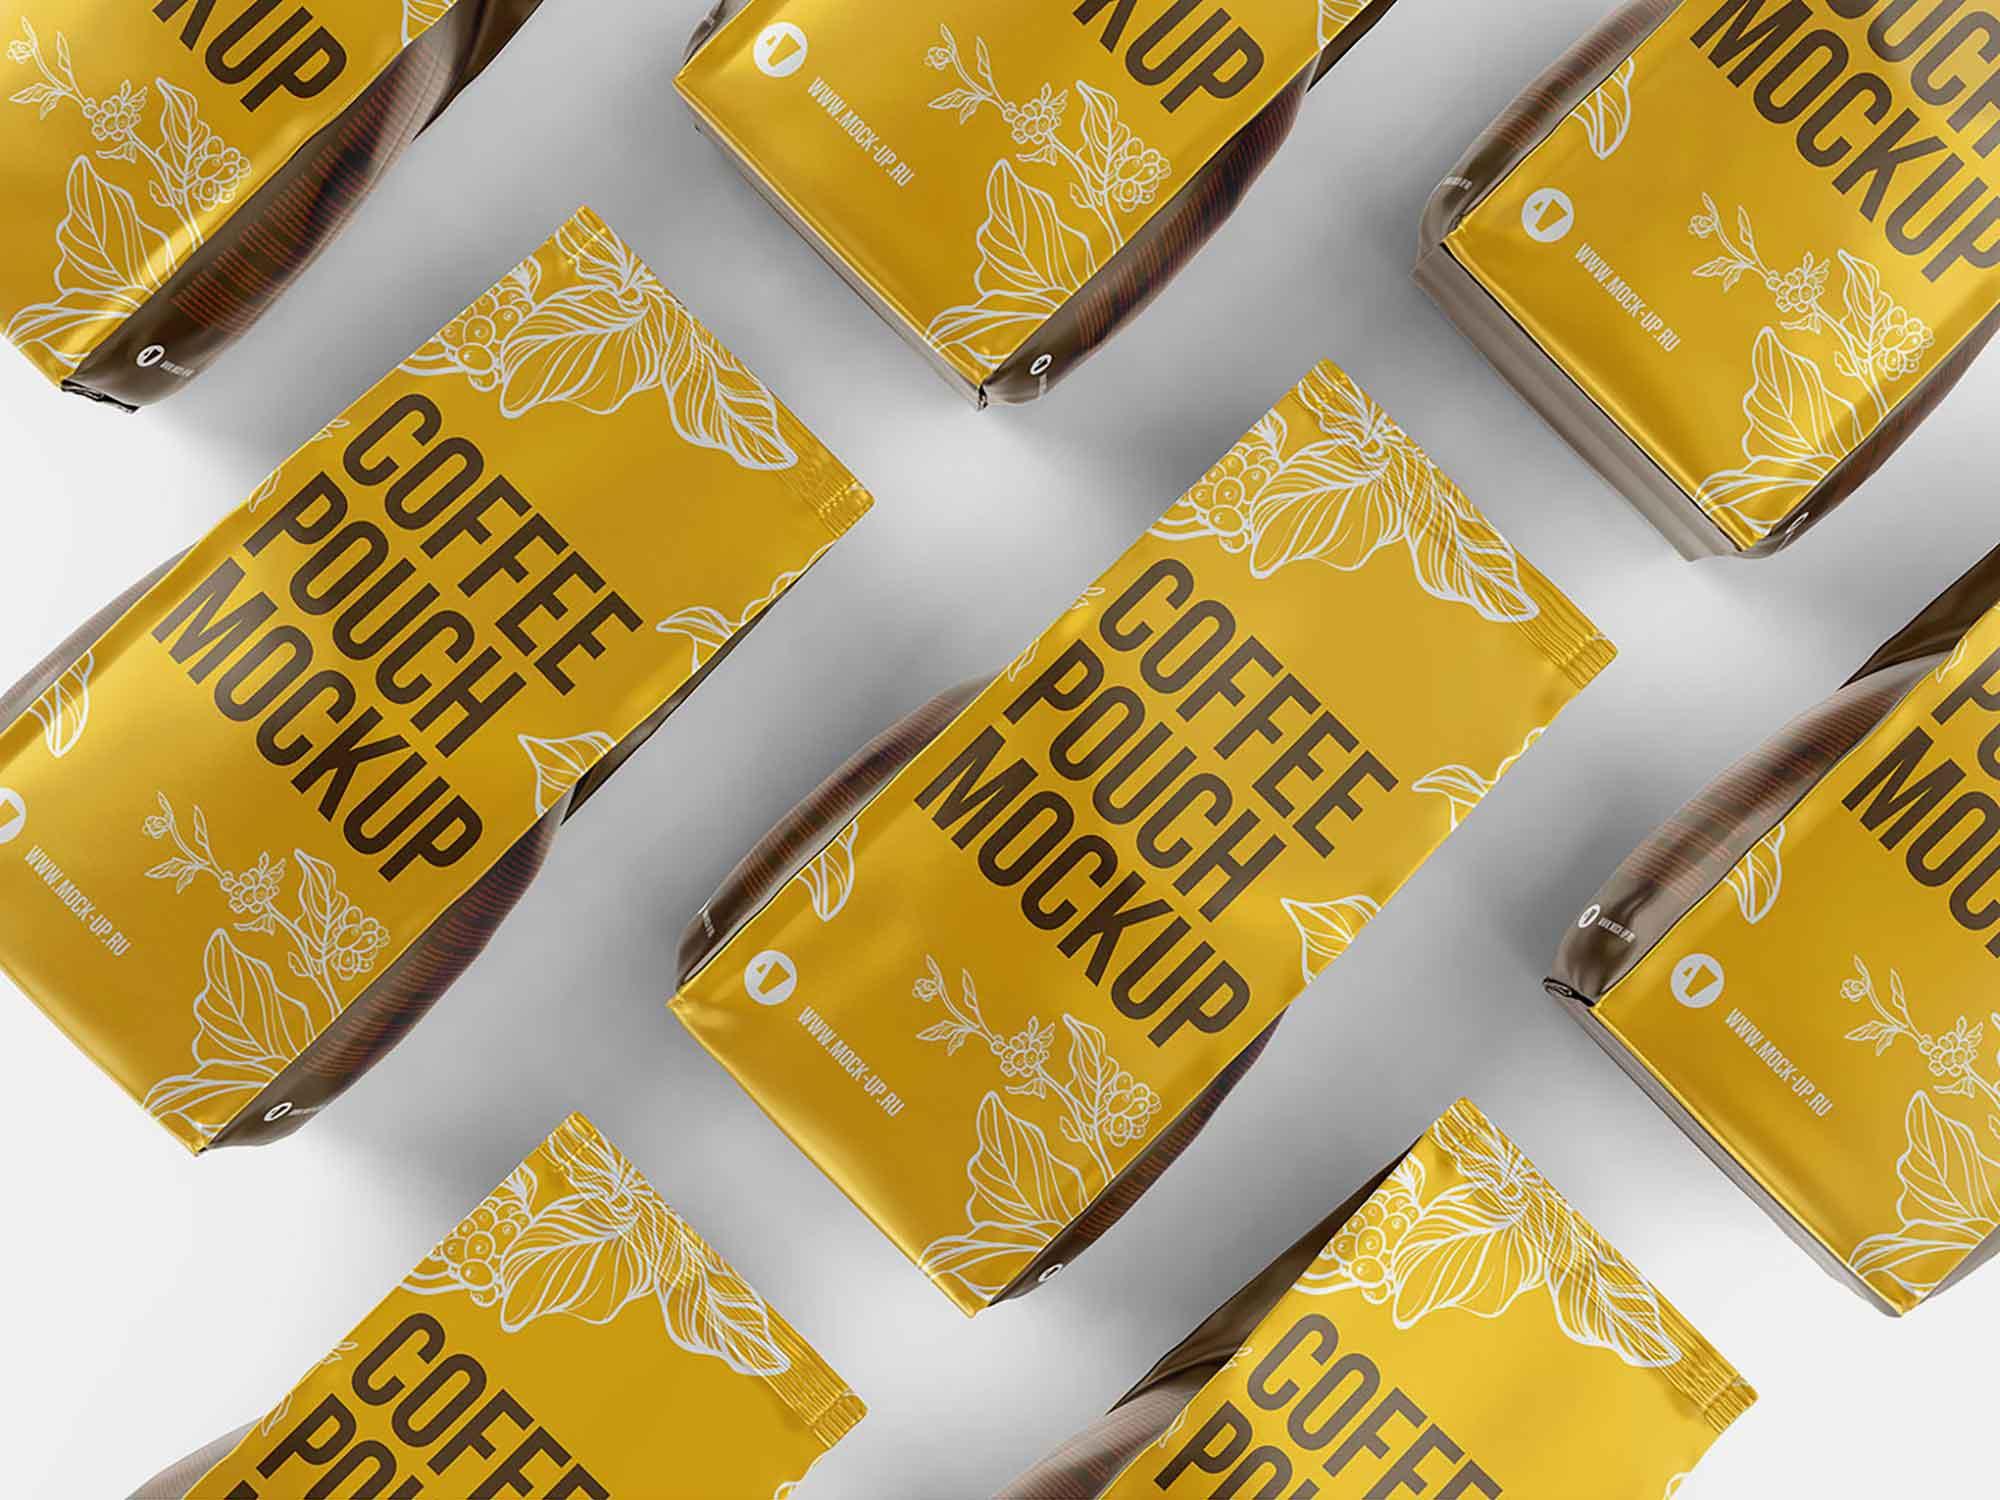 Aluminum Coffee Packaging Mockup